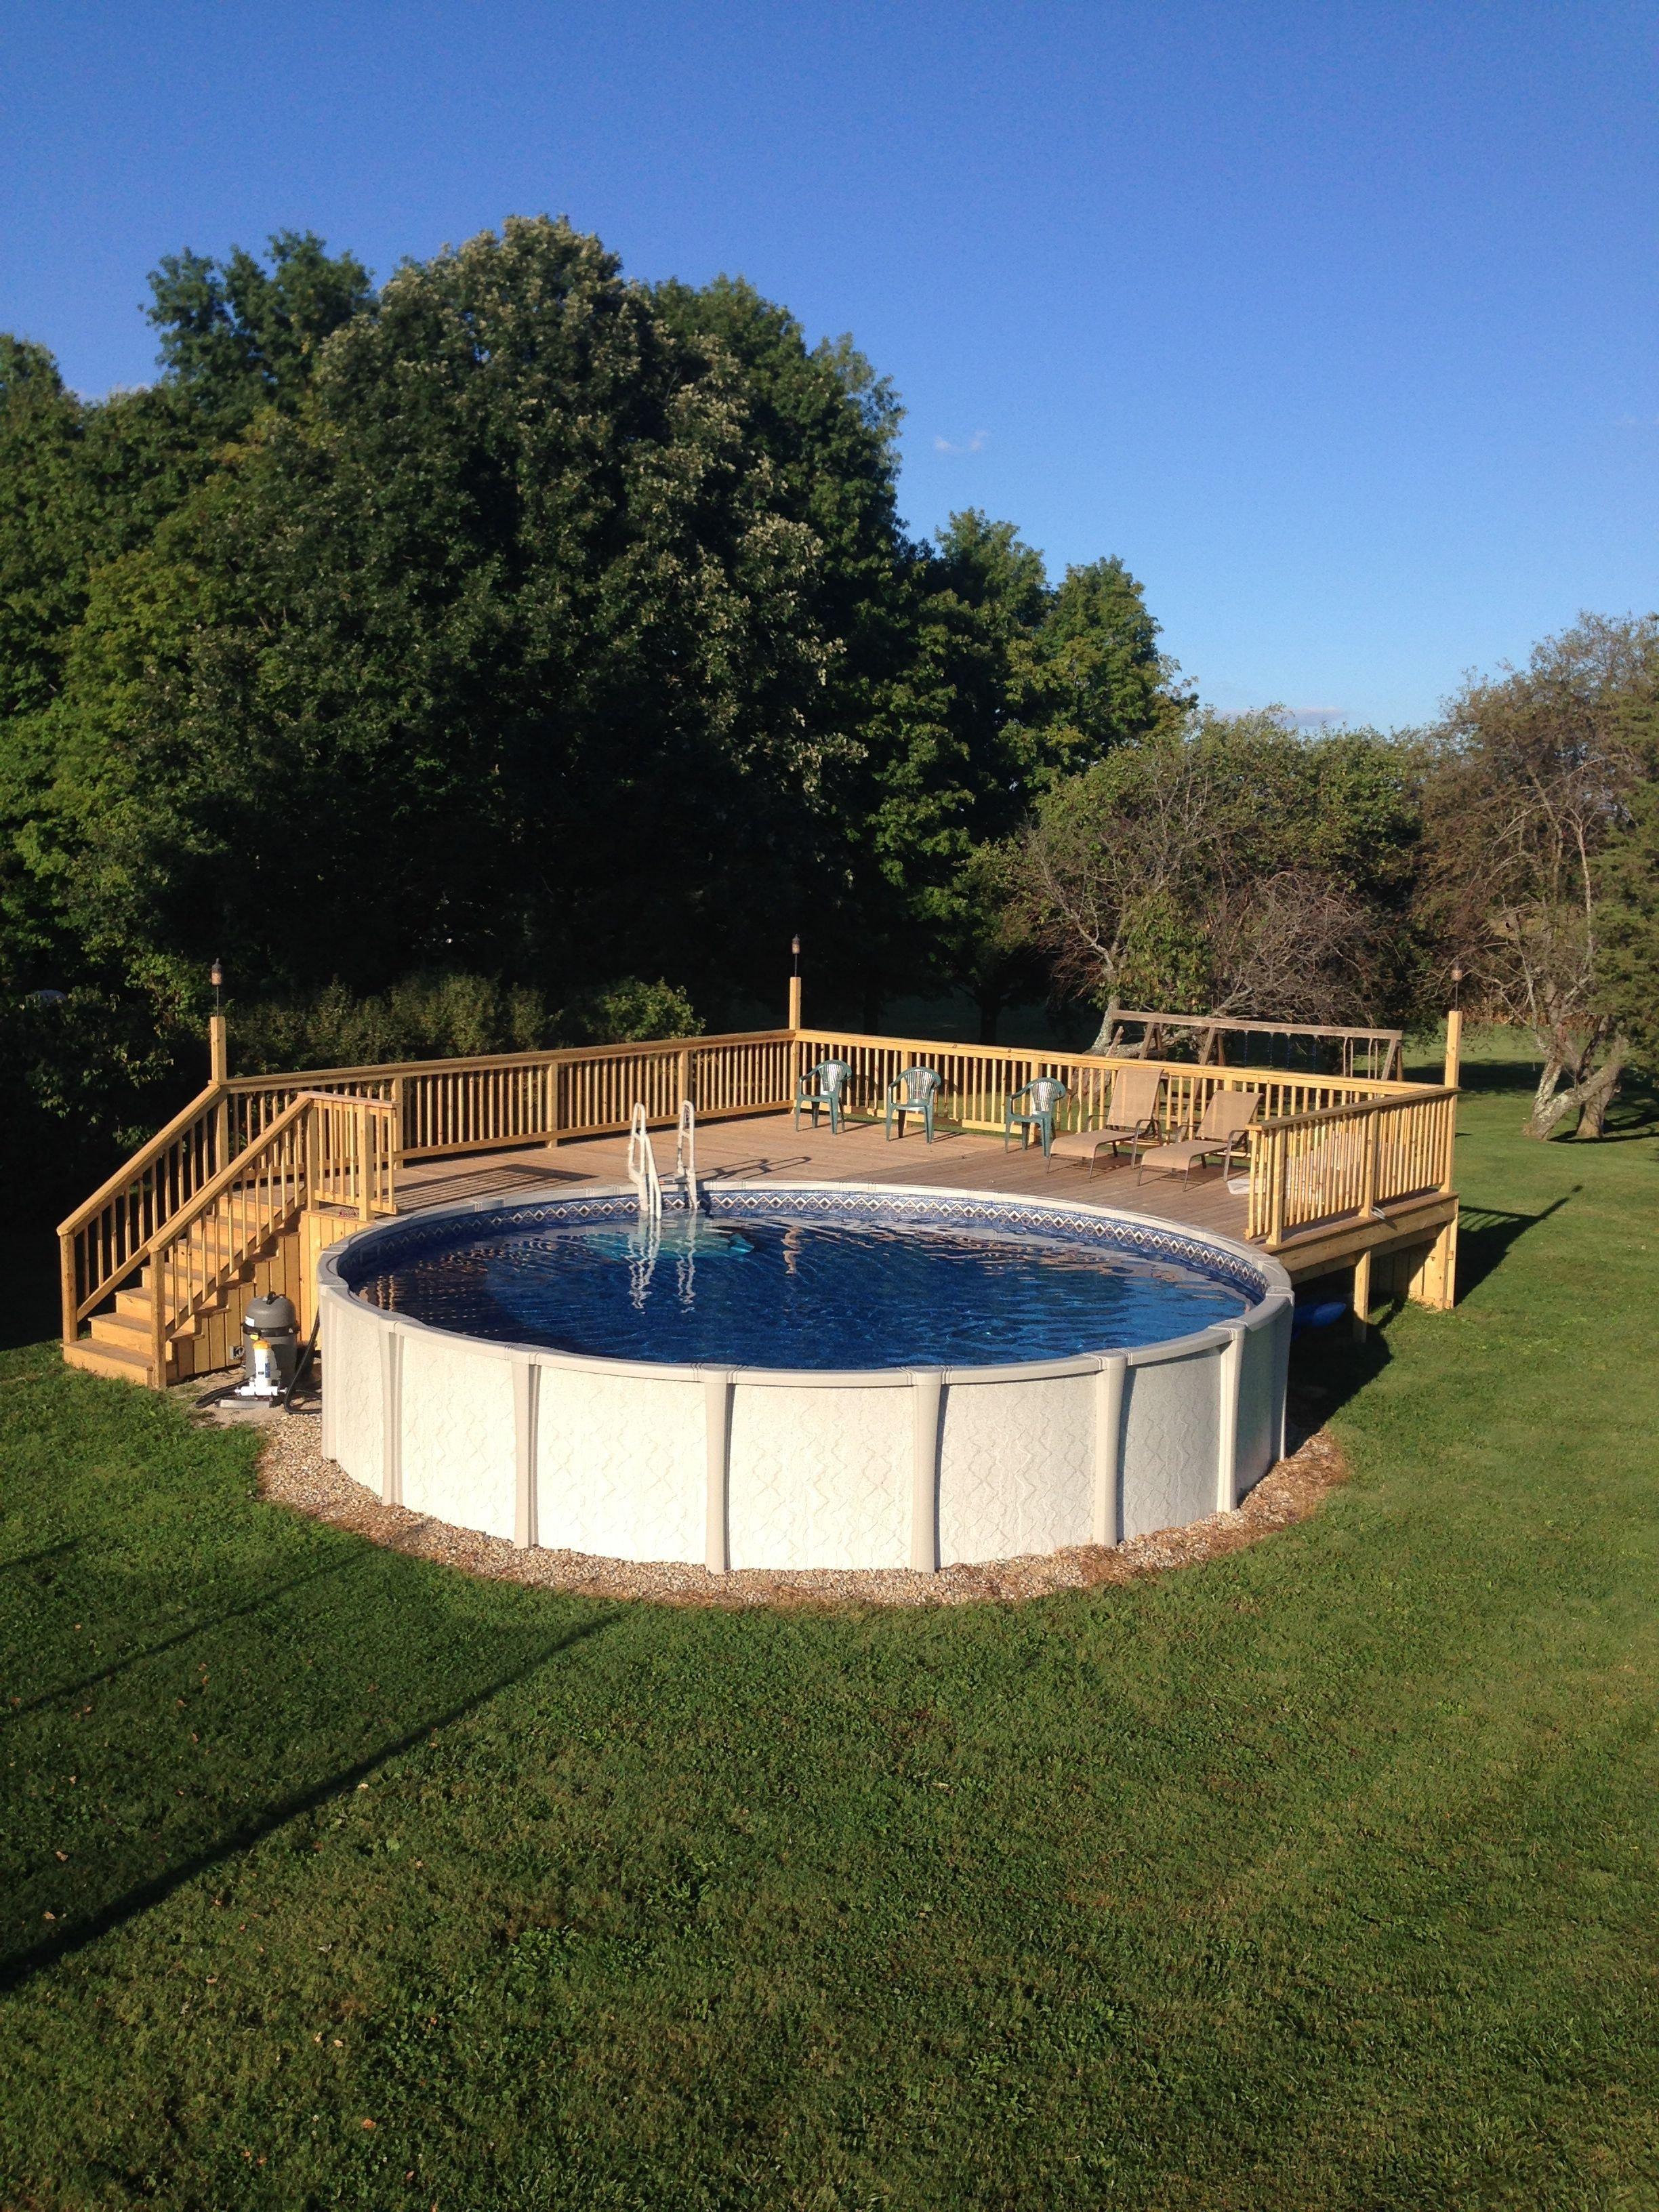 10 Attractive Above Ground Pool Deck Ideas 40 uniquely awesome above ground pools with decks ground pools 1 2020